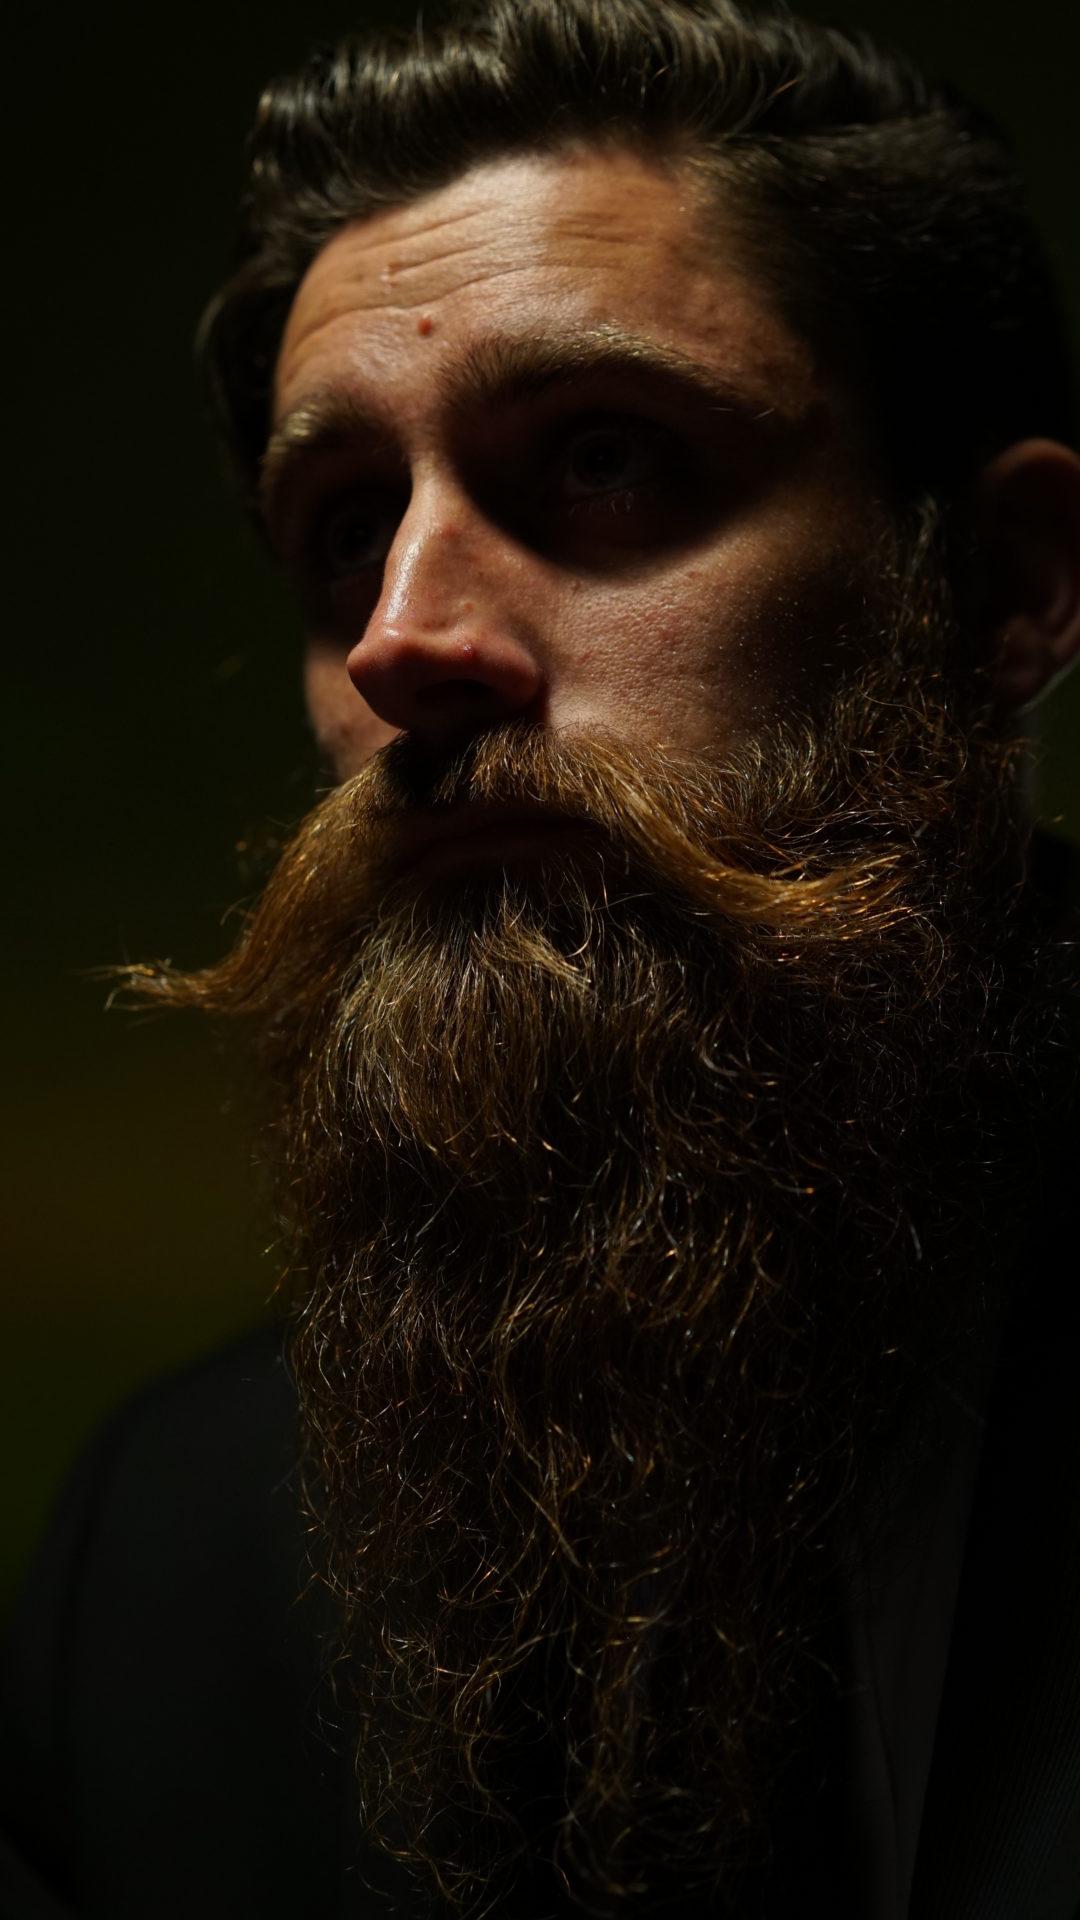 majestic bearded god